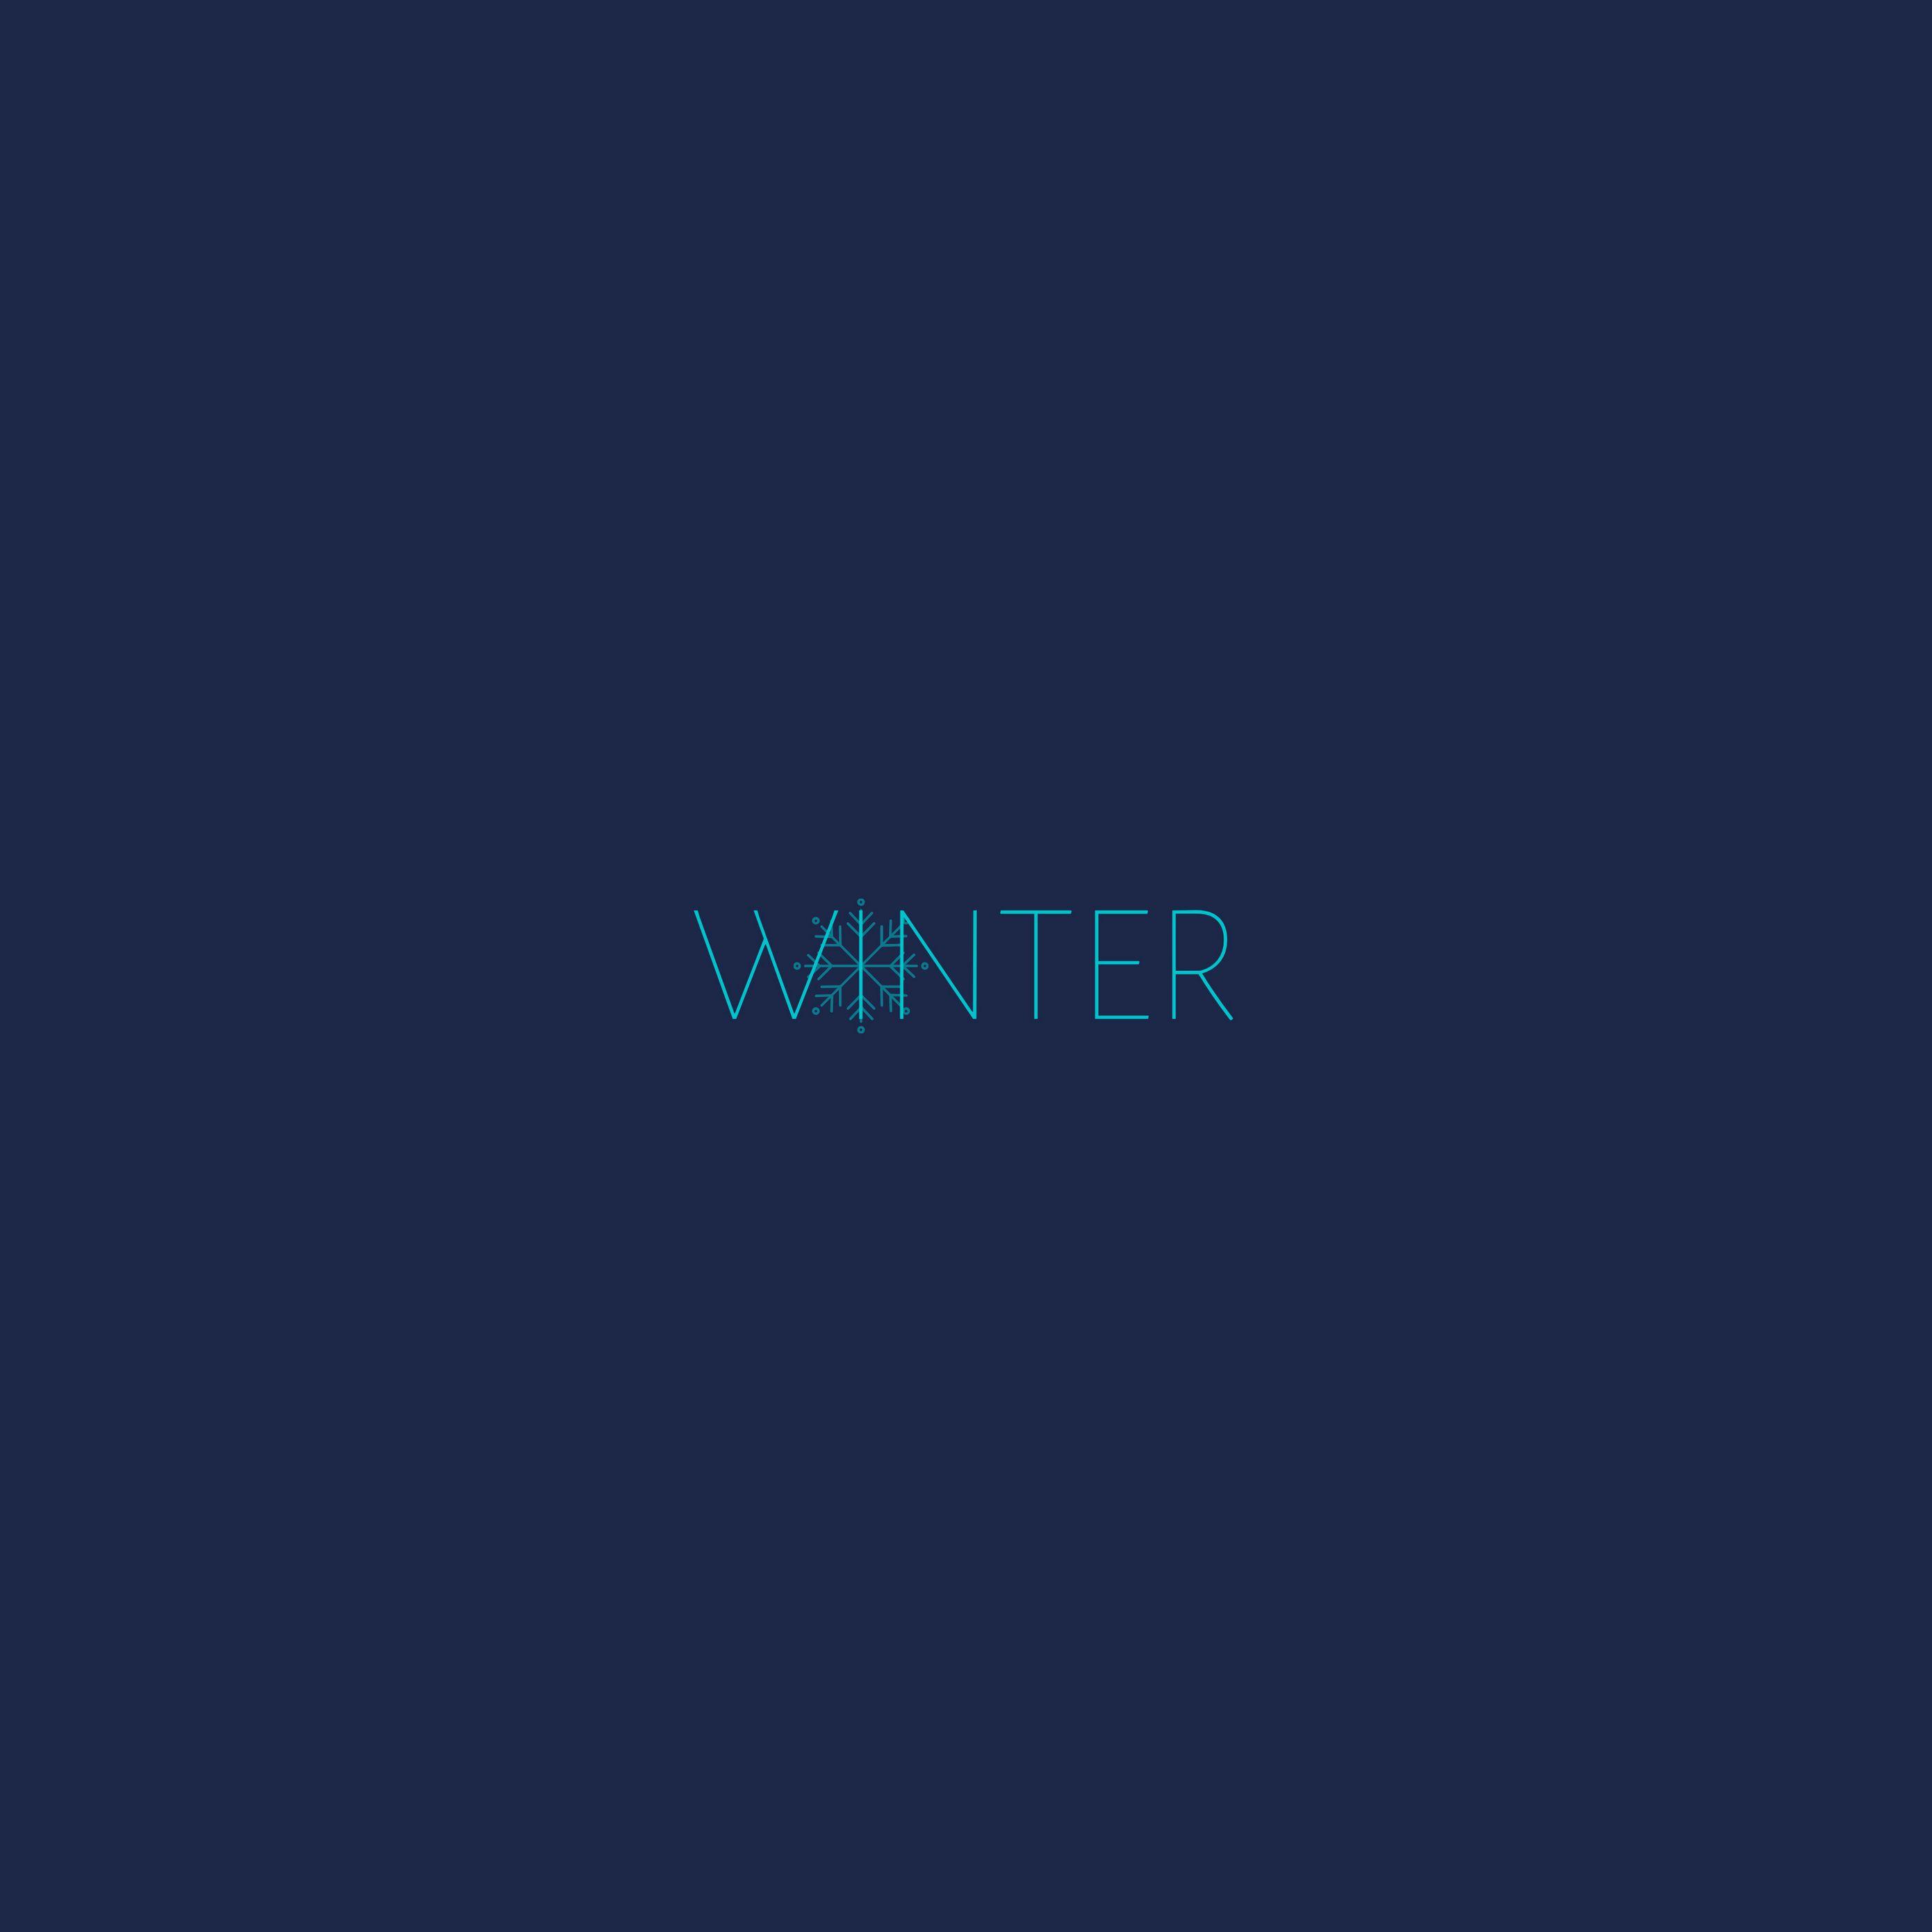 2780x2780 Wallpaper winter, word, snowflake, inscription